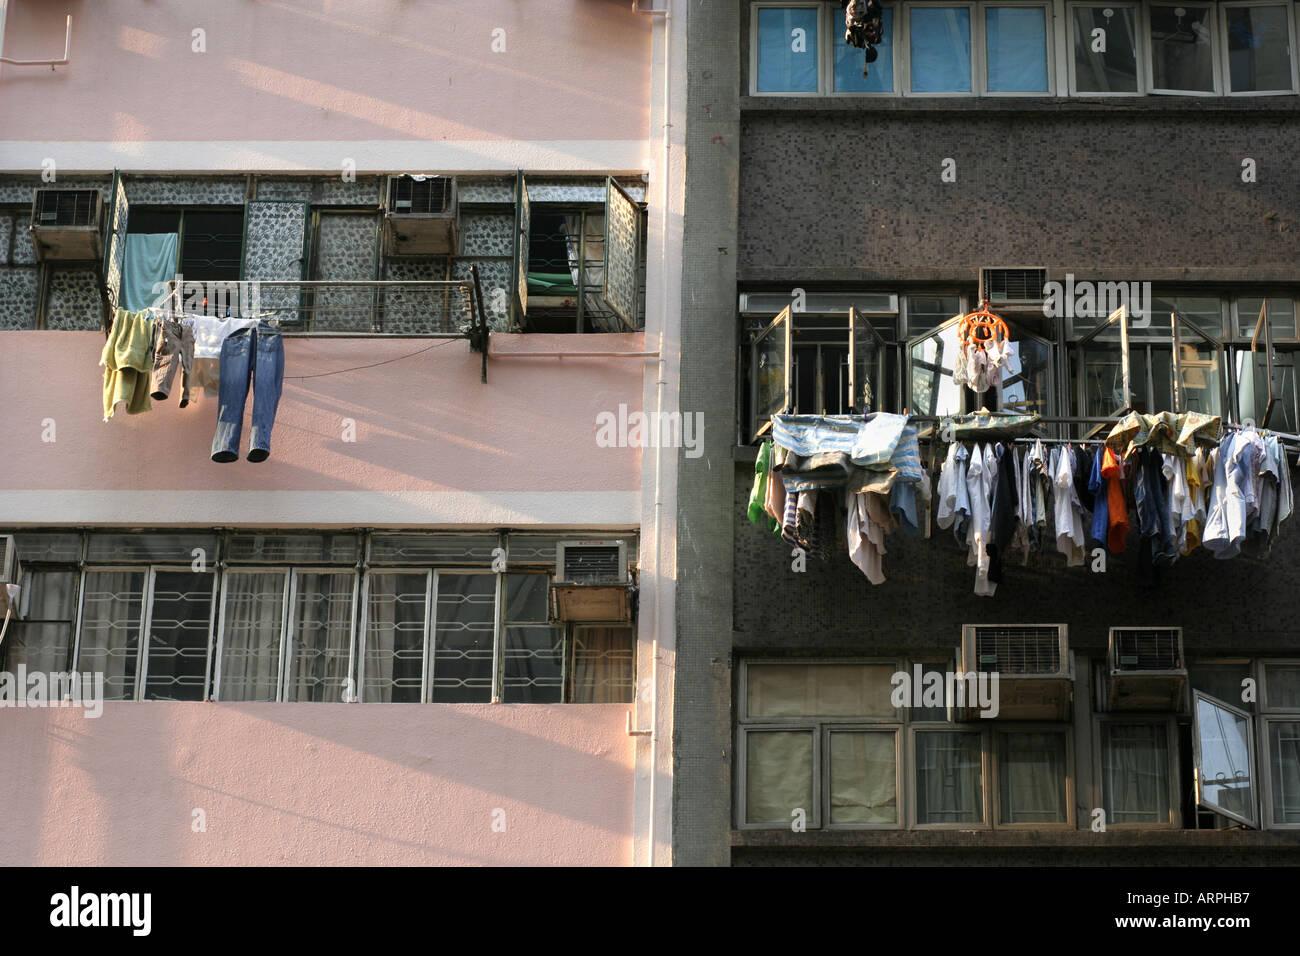 poverty in Hong Kong - Stock Image